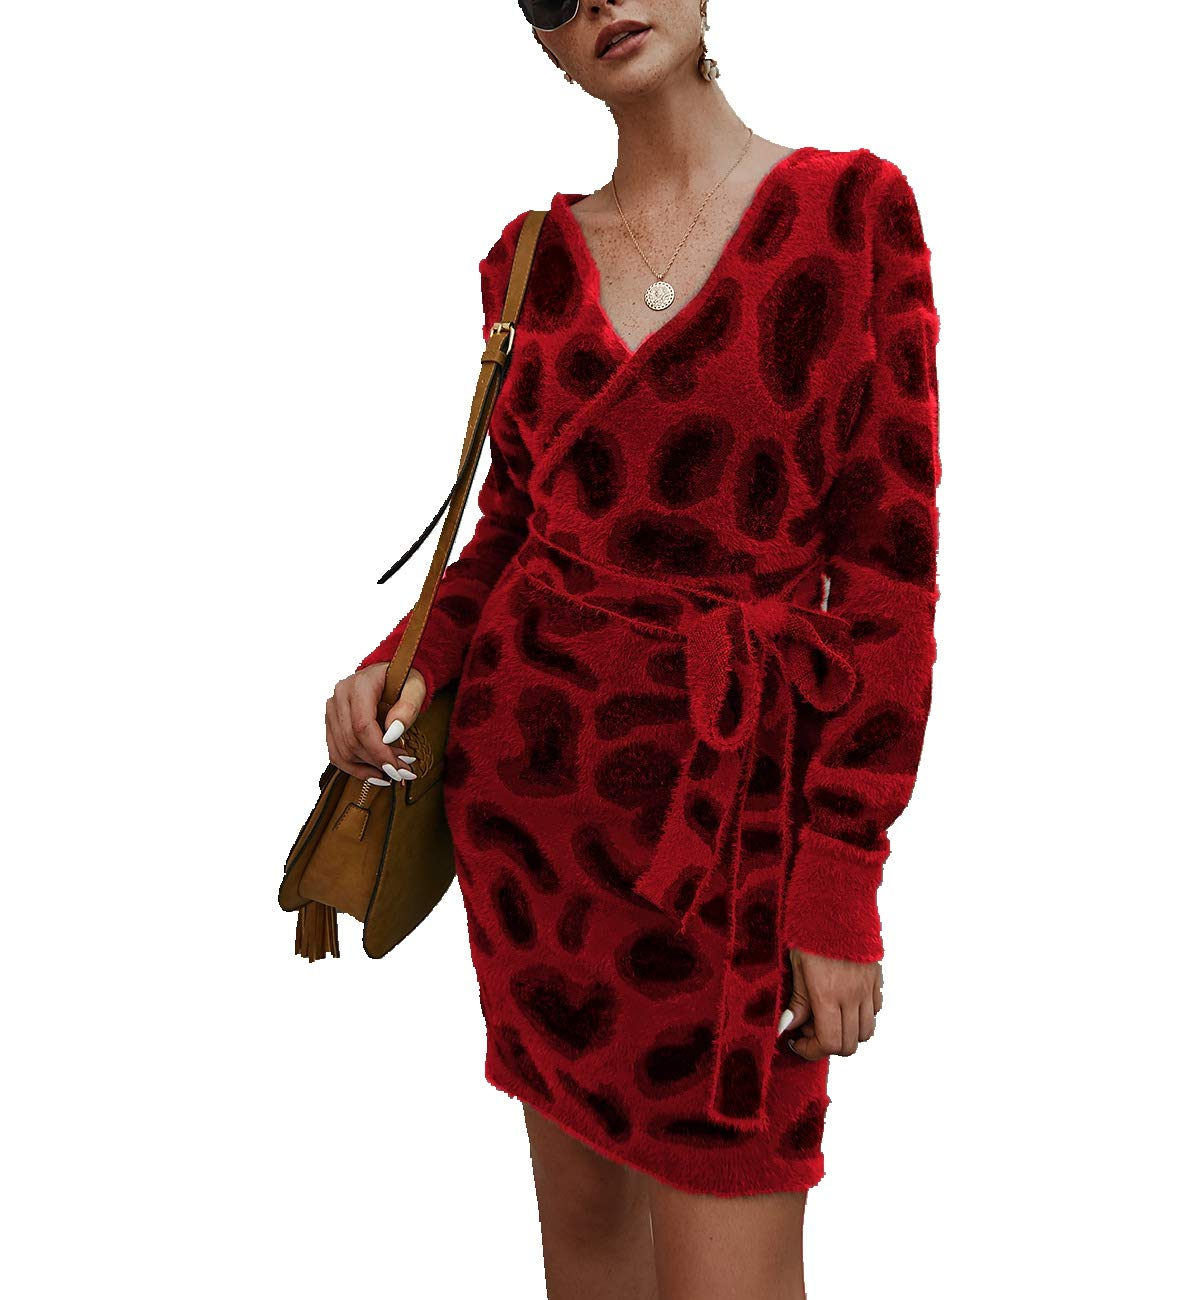 Women's Casual Knit Sweater Wrap Dress,Long Bat Wing Sleeve Leopard Print V Neck Backless Slim Fit Pencil Dresses with Belt Red by KINGLEN Womens Dress